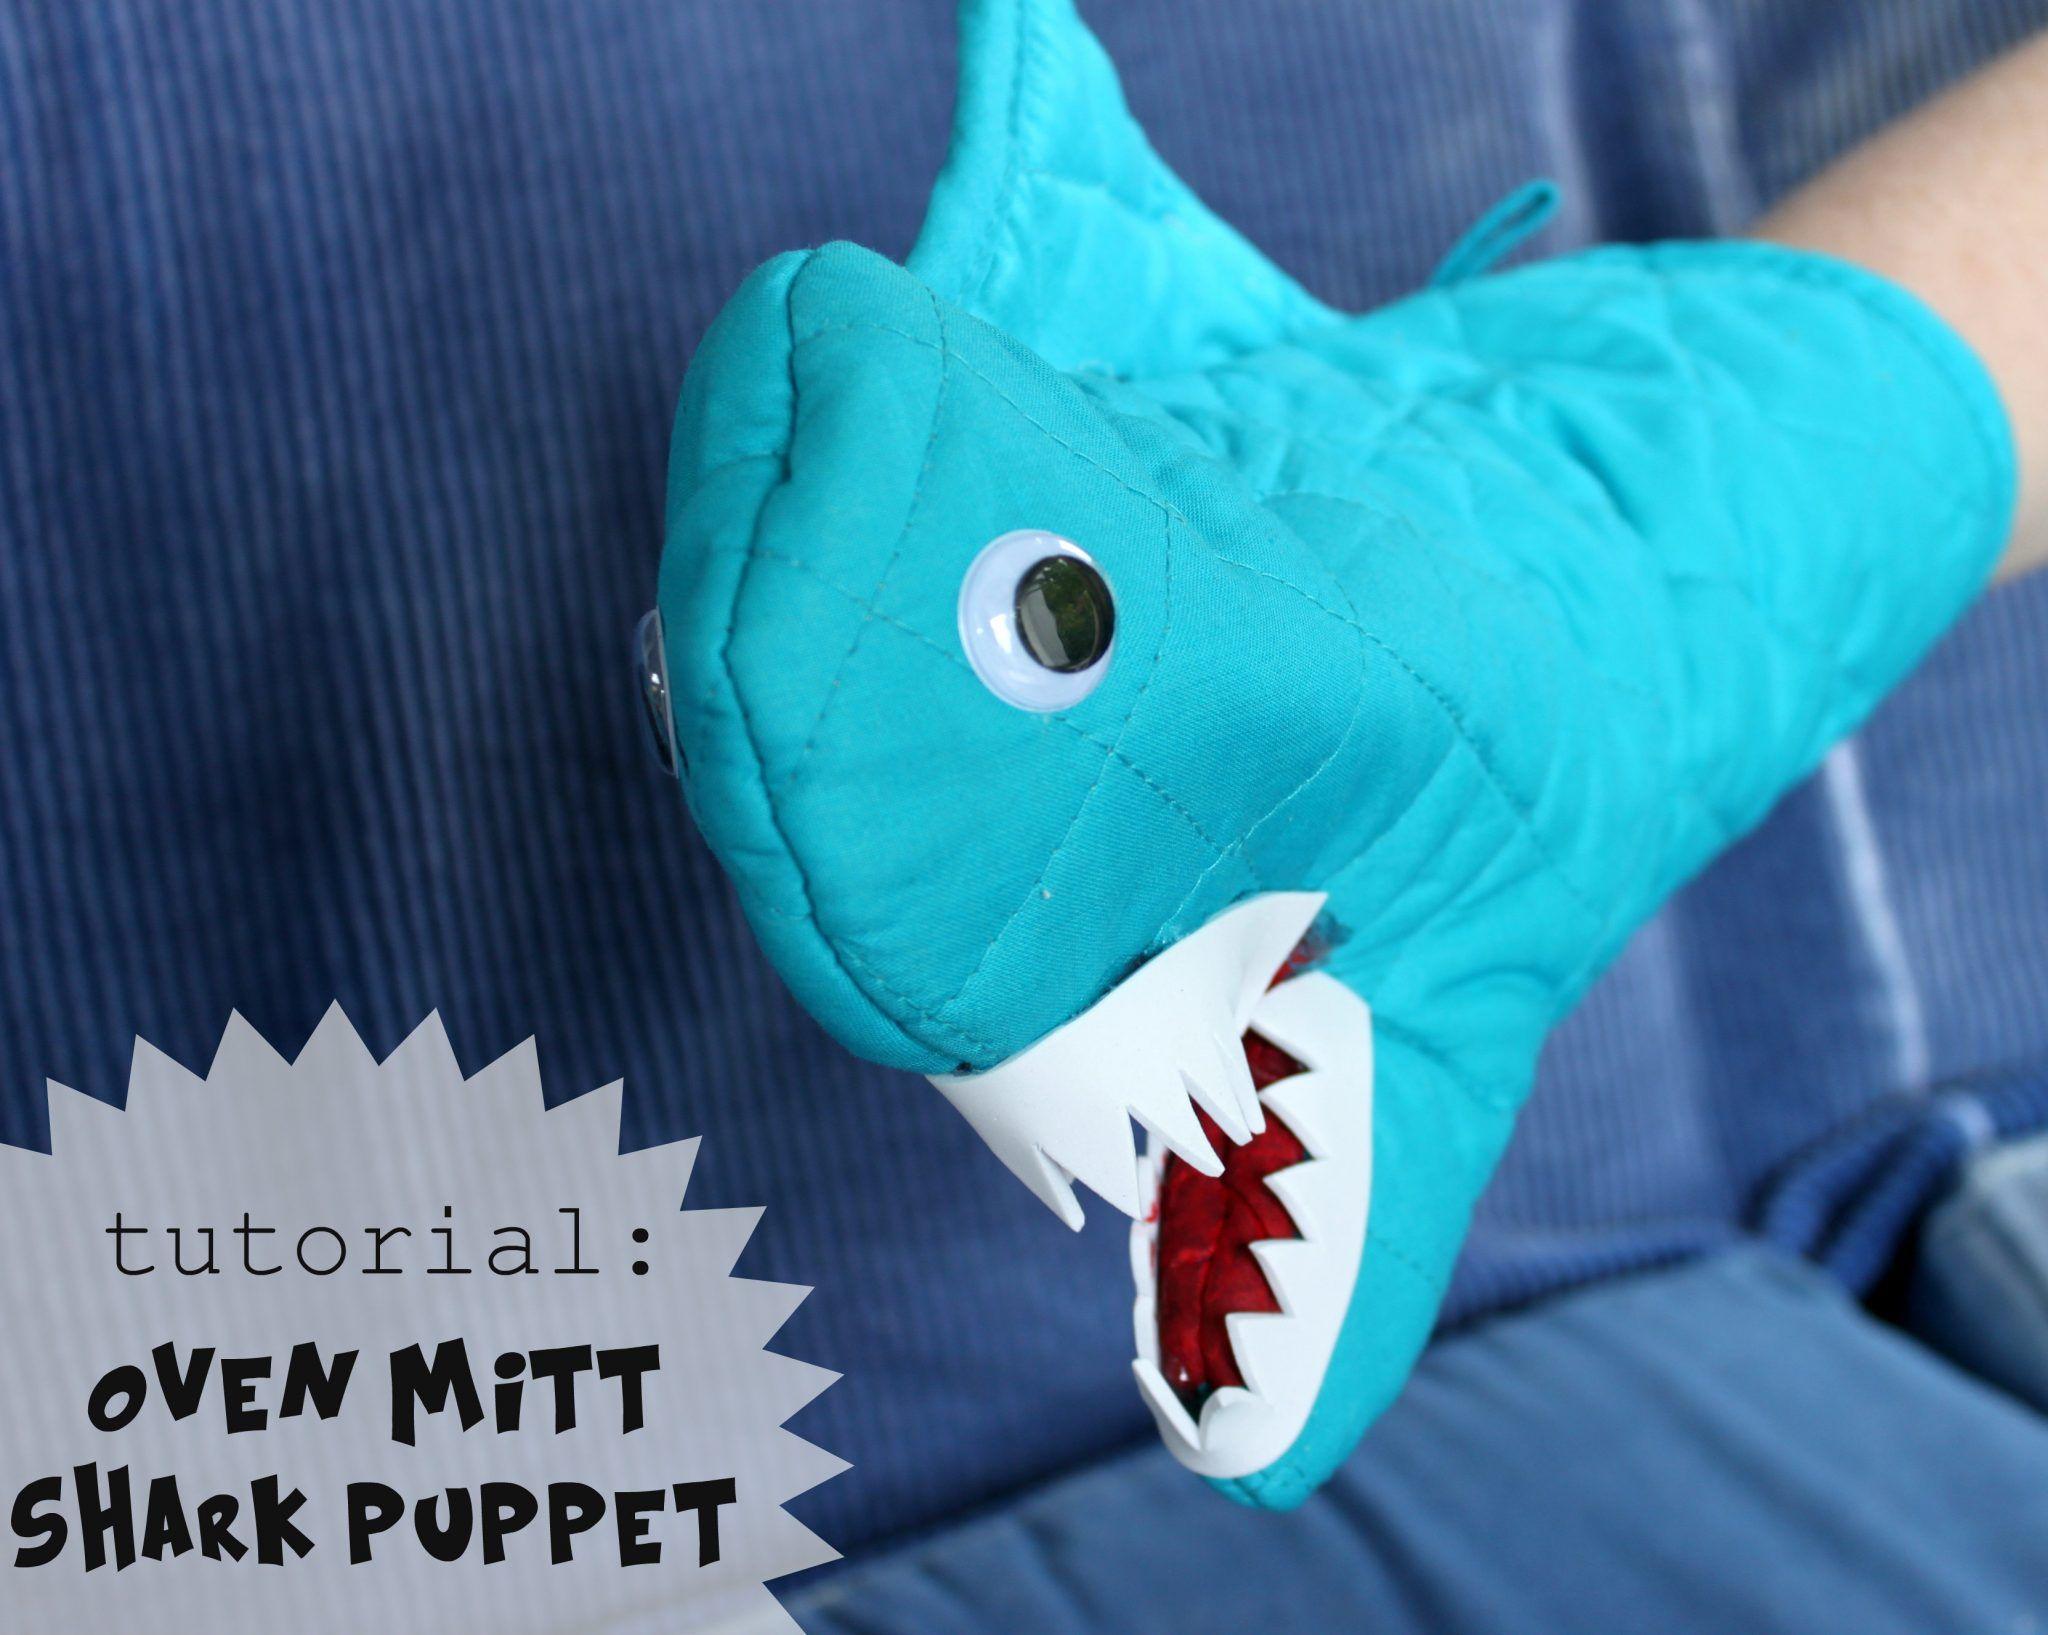 Tutorial Oven Mitt Shark Puppet Activities Guantes De